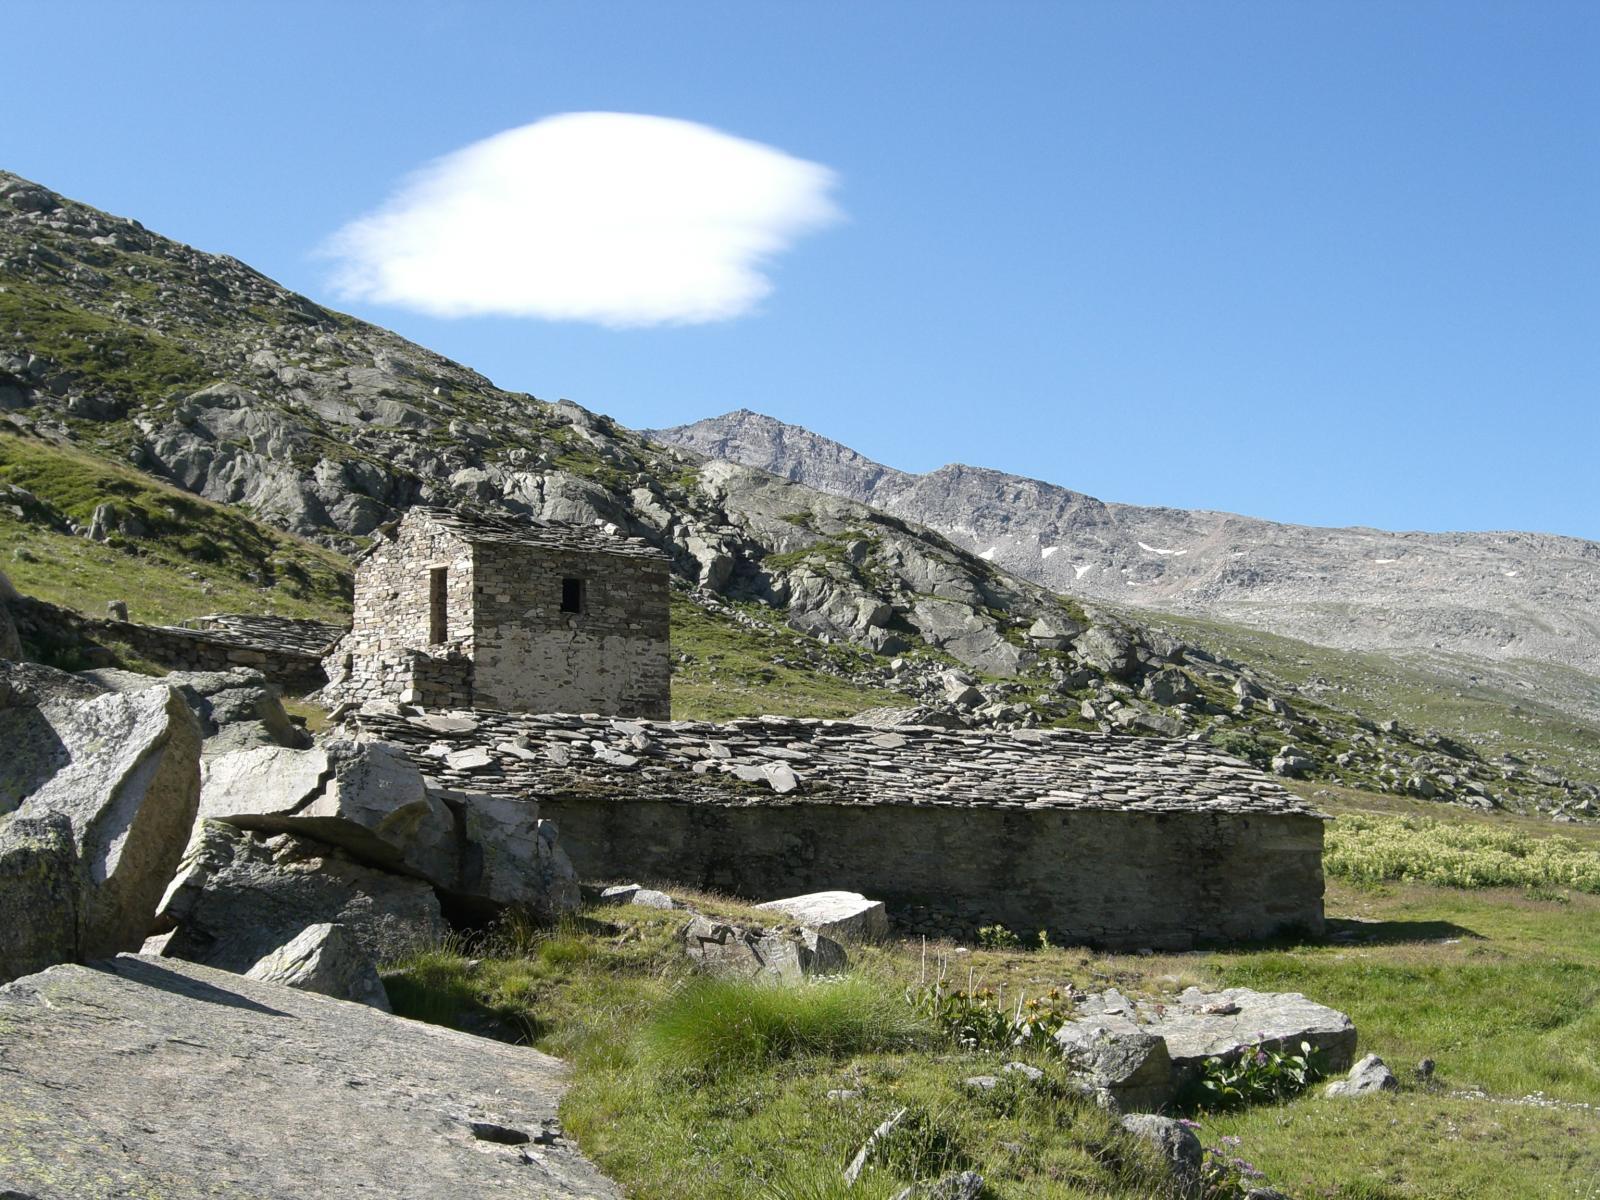 Gianzanaz (Monte) o Giansana e Cima dell'Arolley dal Colle del Nivolet 2014-08-04